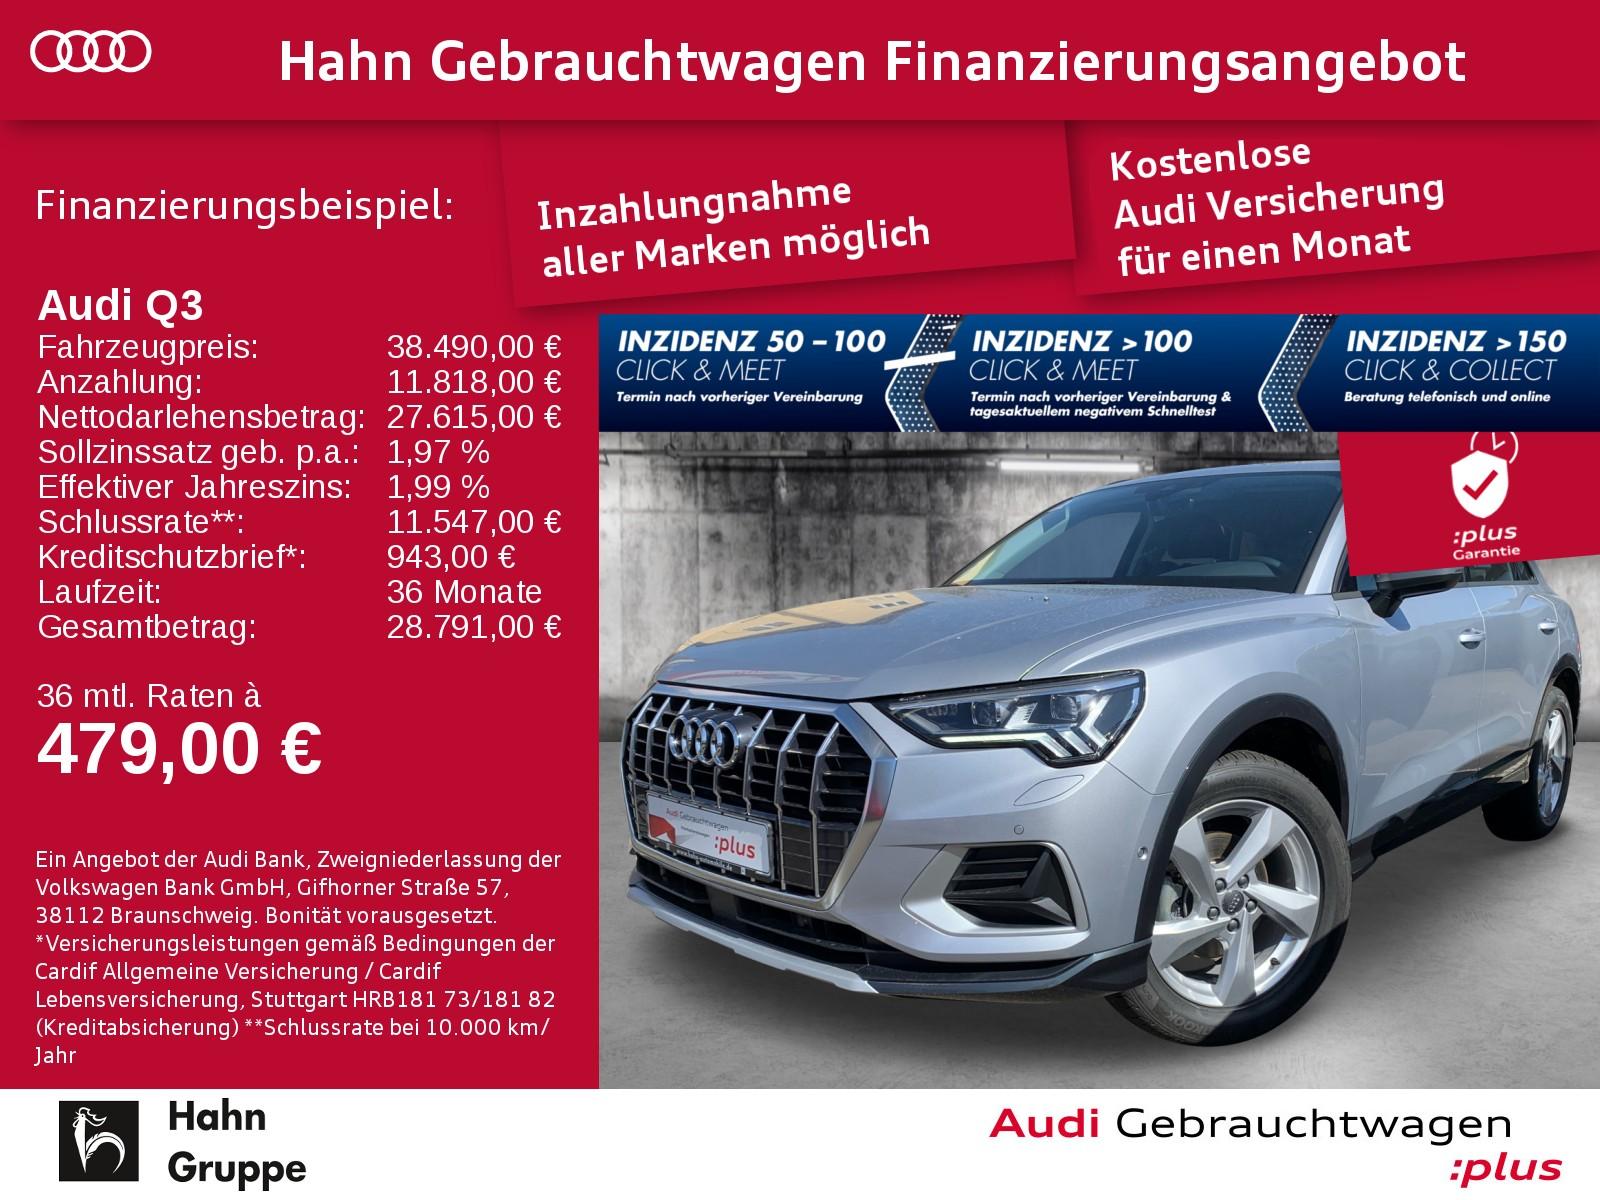 Audi Q3 35 TFSI S-trc Navi LED Sitzh Einpark, Jahr 2020, Benzin